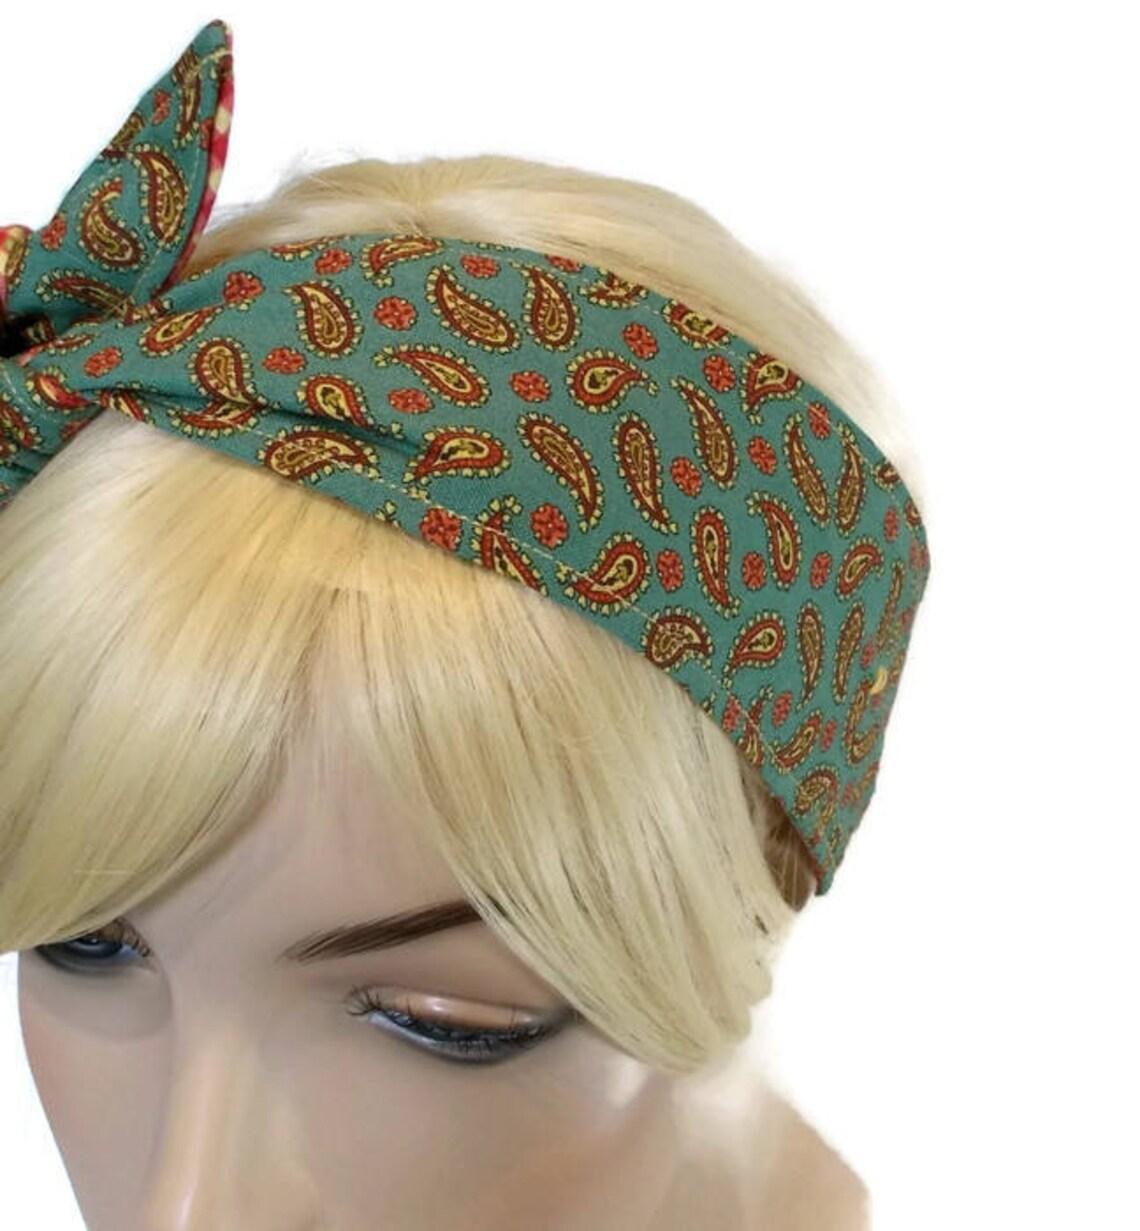 Green Headband Red Headband Wired Headband Womens Headband  c782b579a0b